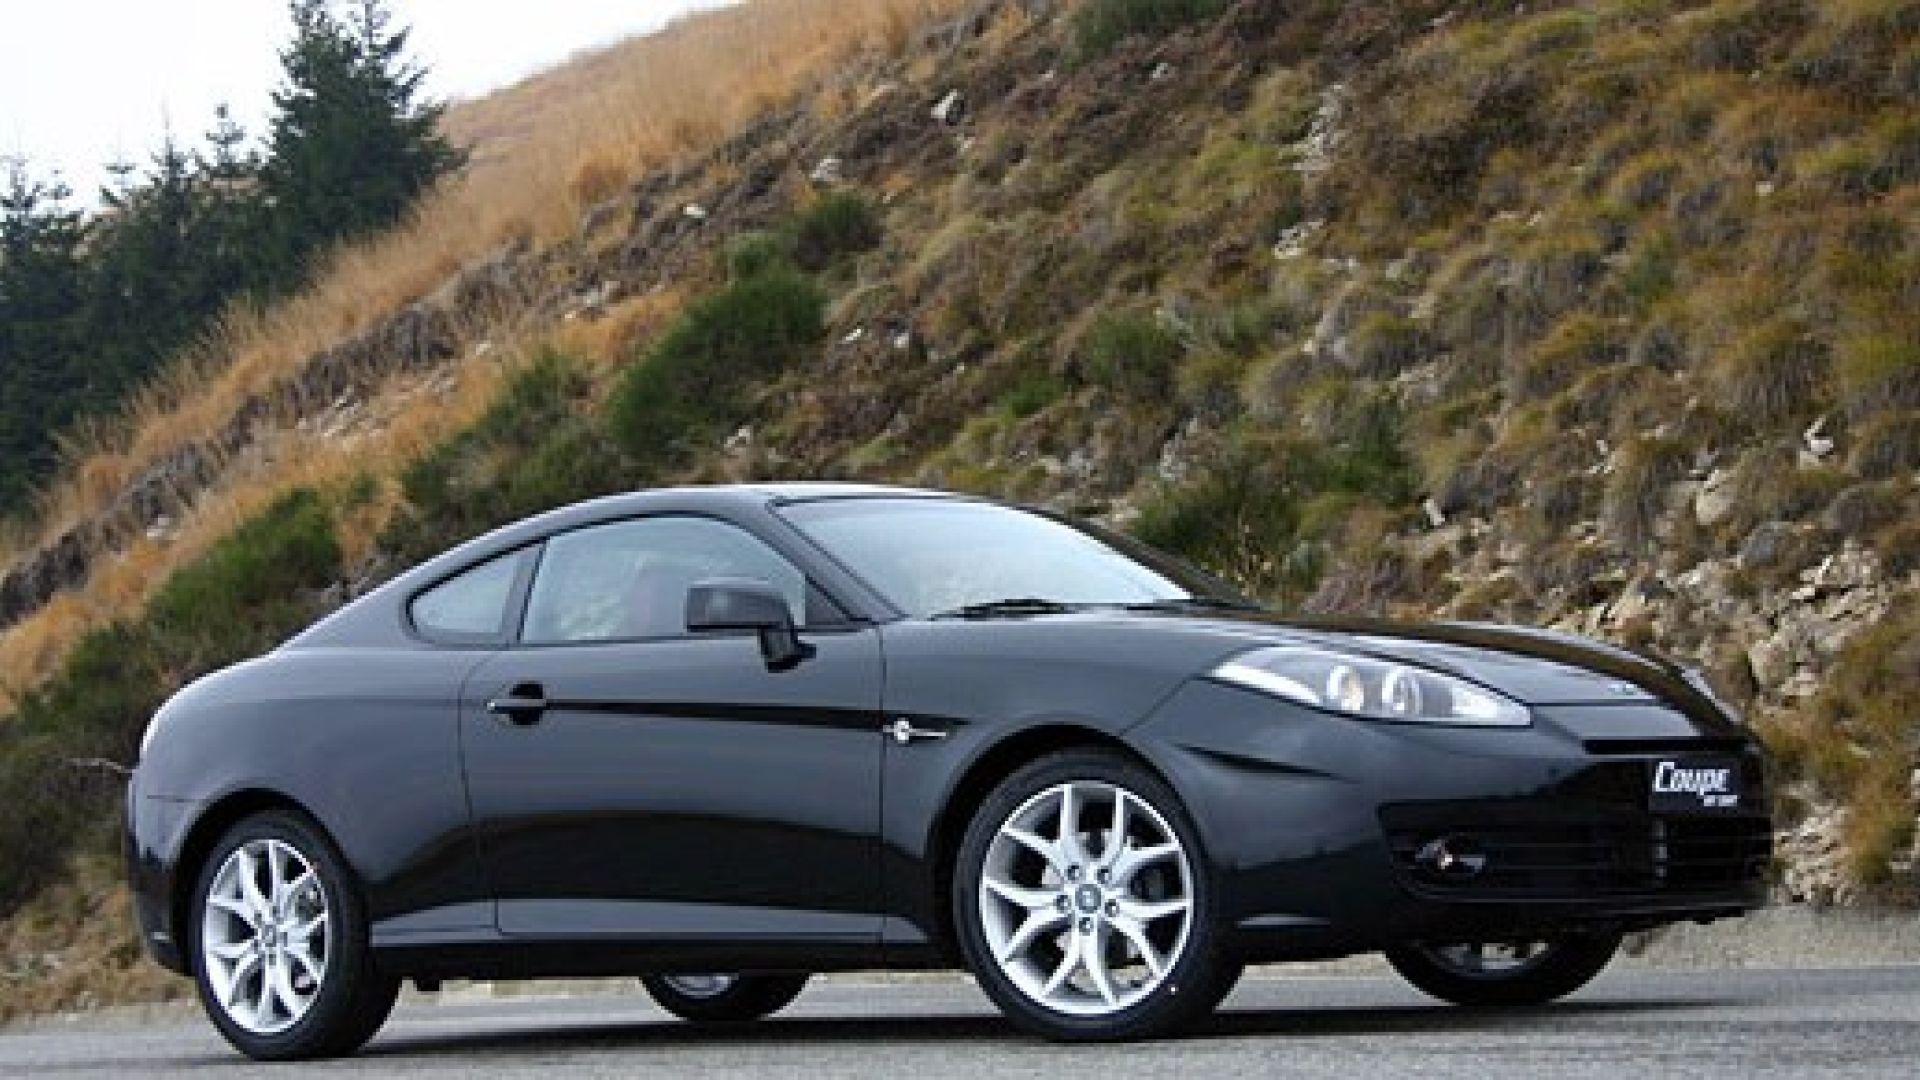 Test Drive Hyundai Coupe 1 6 Motorbox